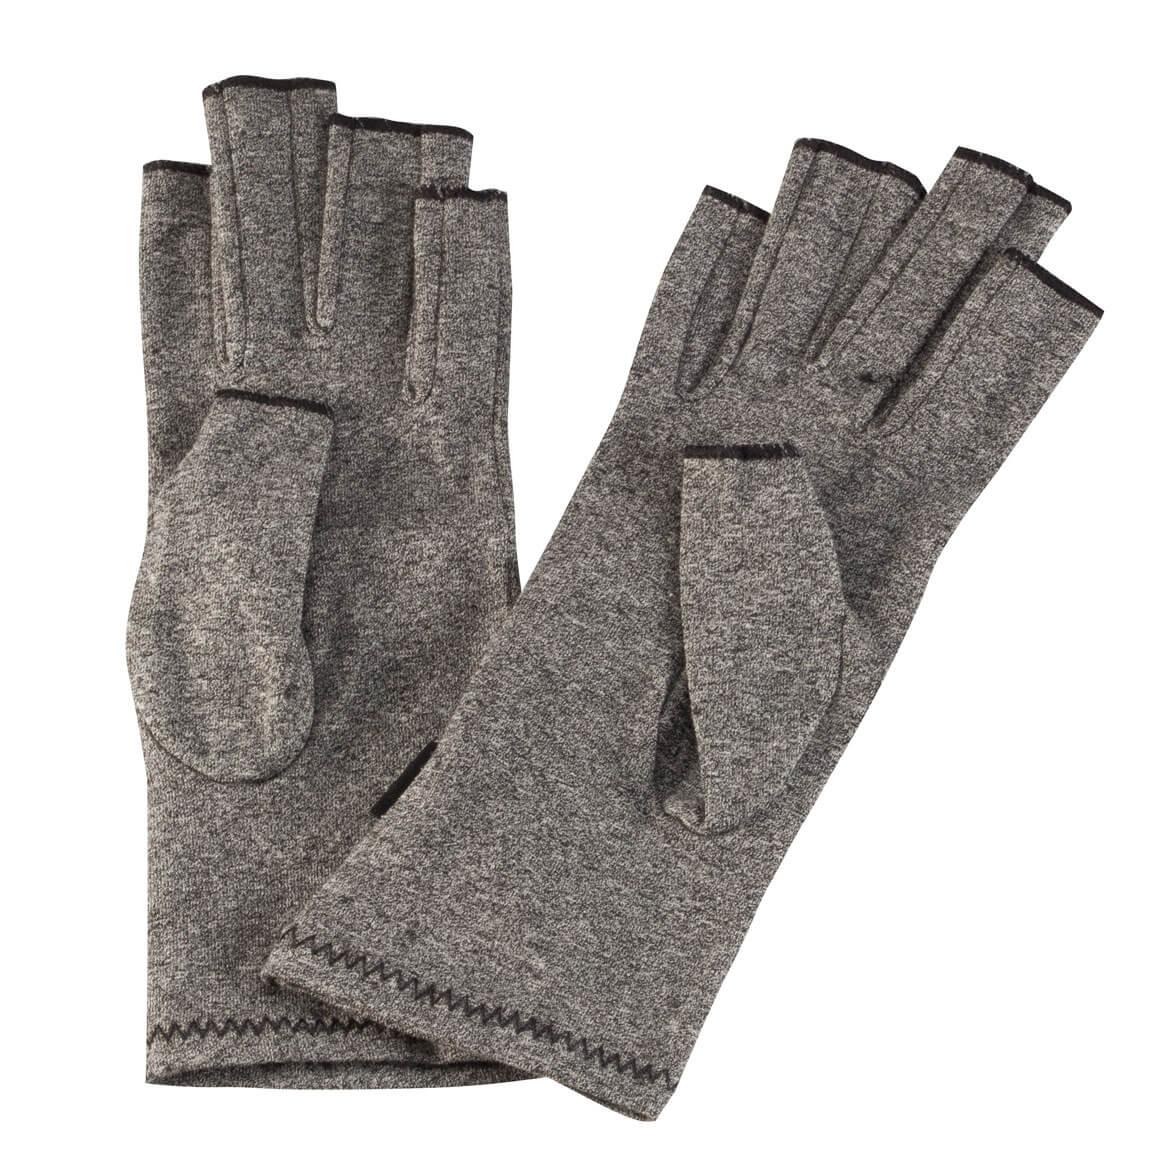 Lycra® Compression Gloves For Arthritis - 1 Pair-336036